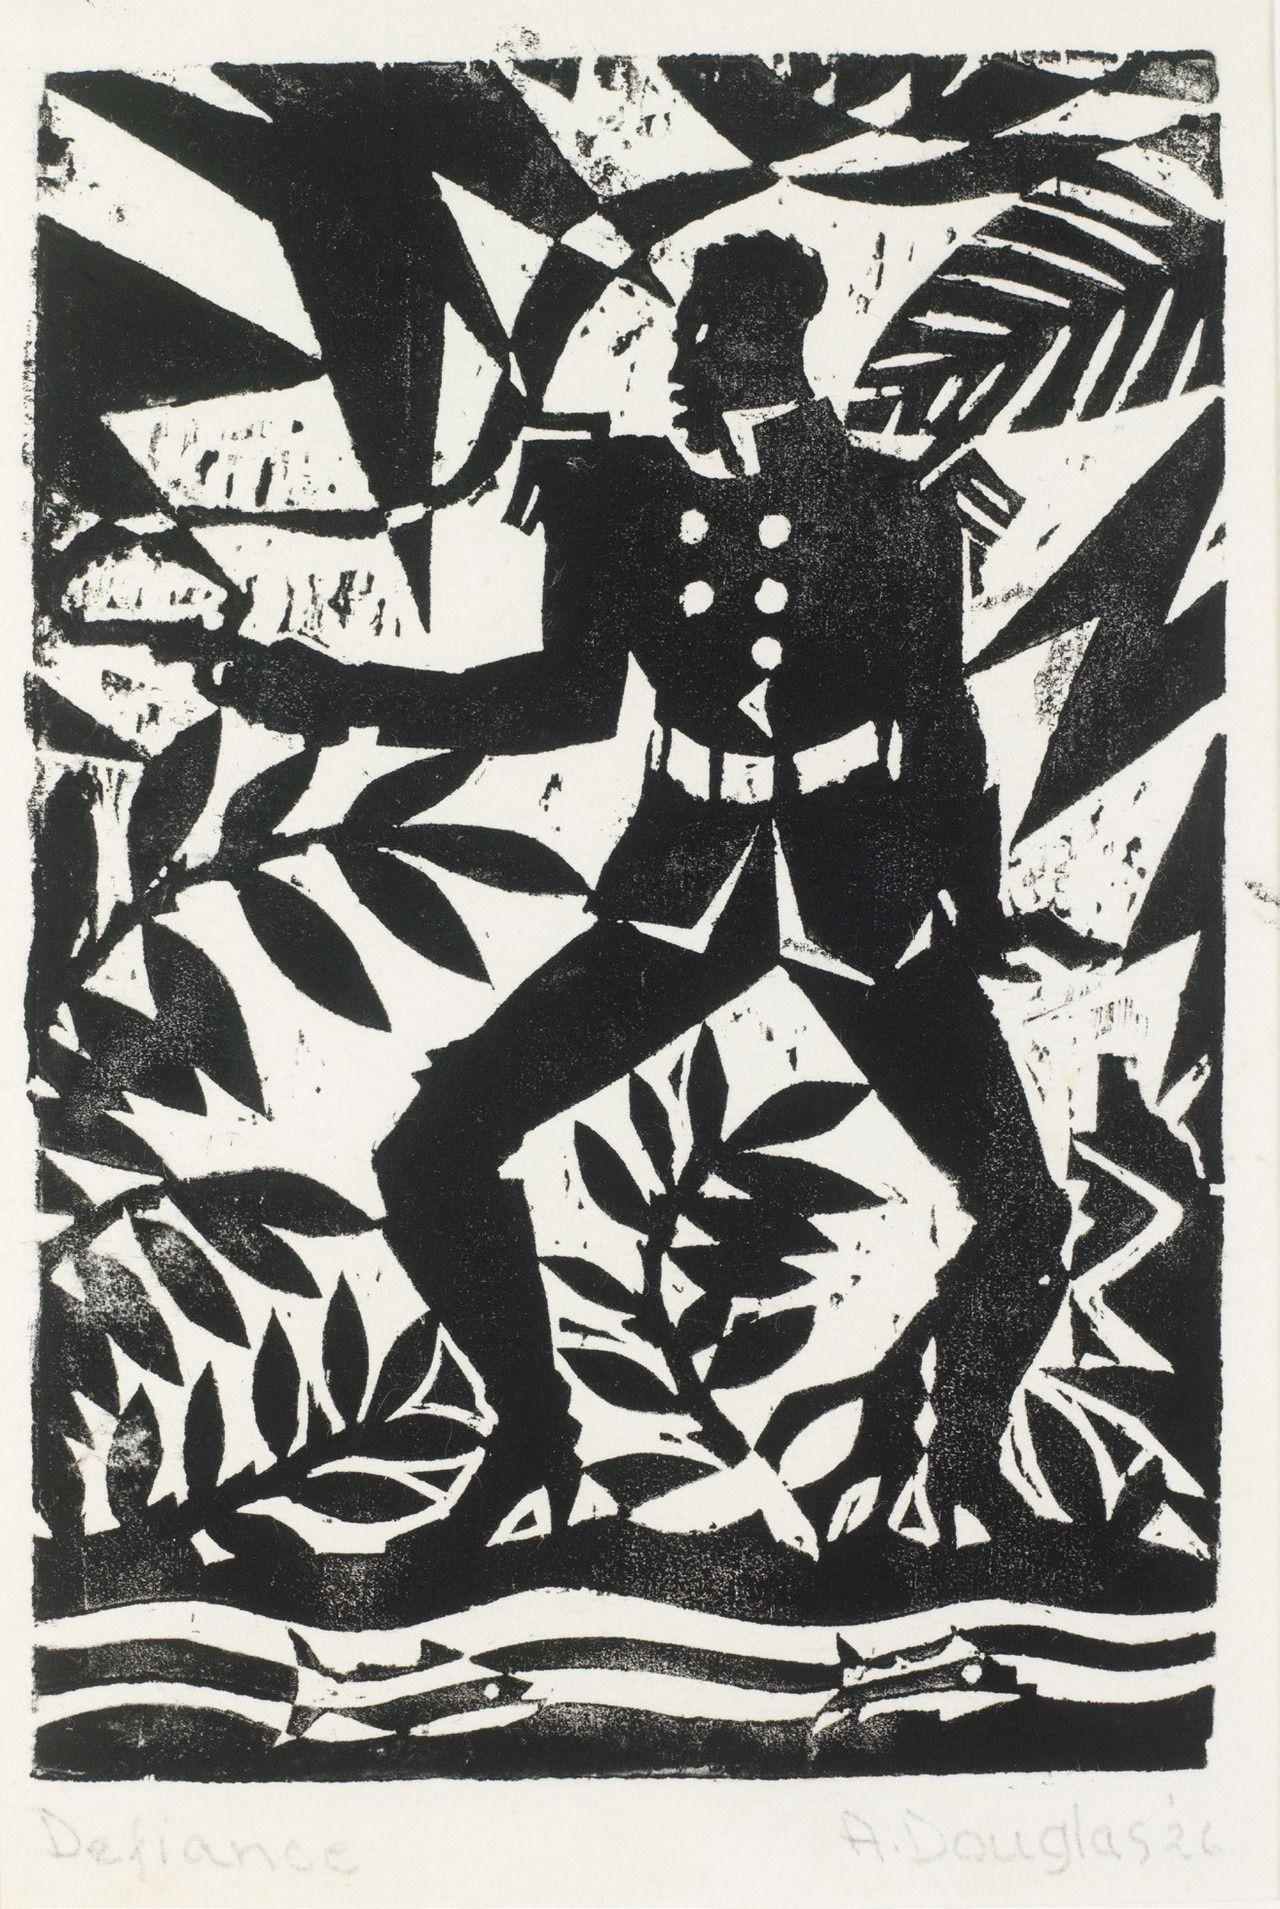 Aaron Douglas Defiance From The Emperor Jones Series 1926 Wood Block Print Printmakin Harlem Renaissance Artists Harlem Renaissance African American Art